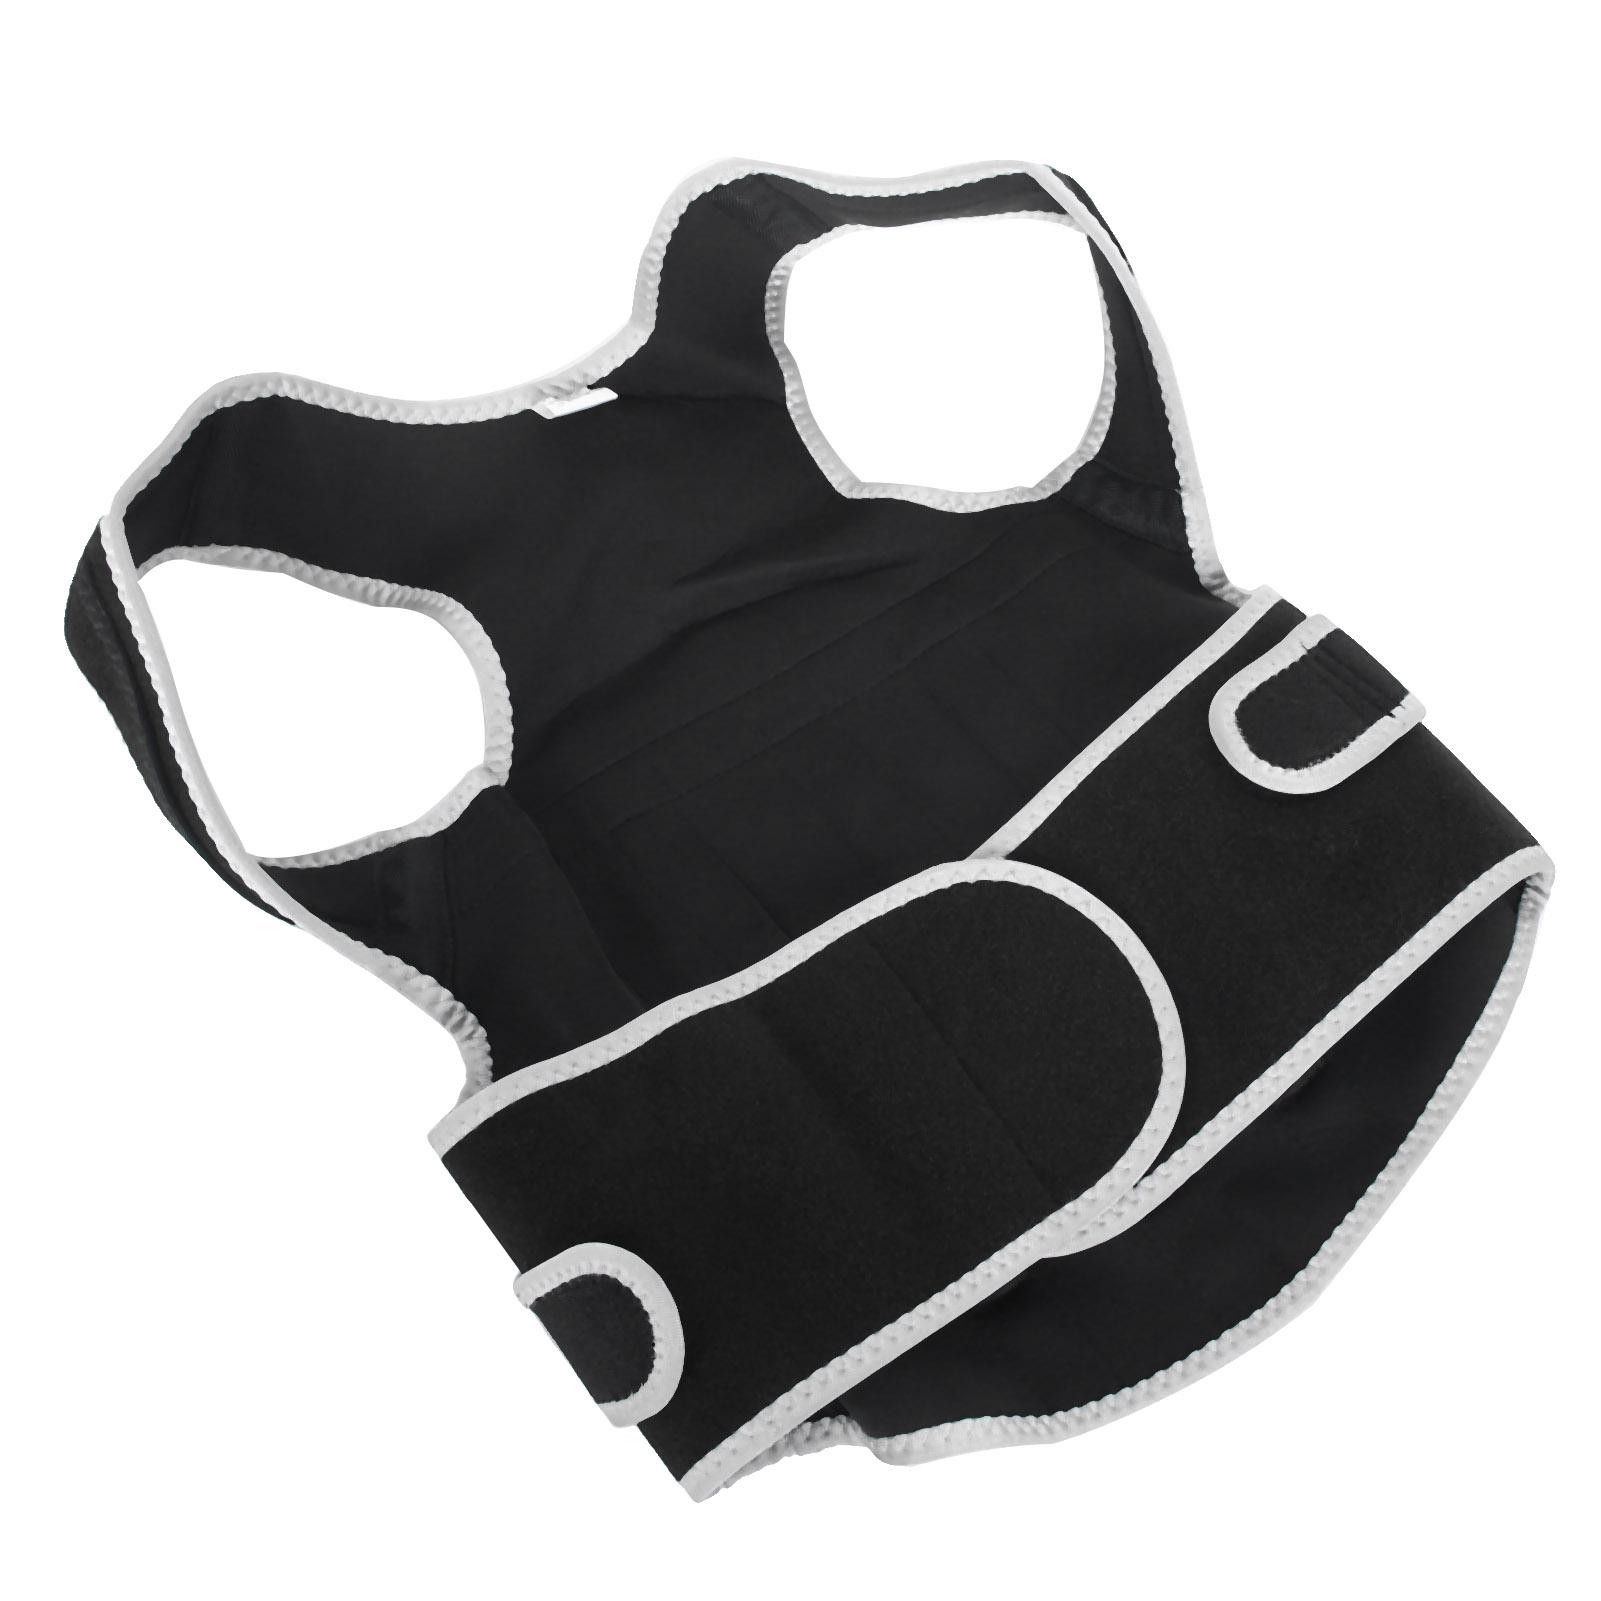 Posture-Corrector-Breathable-Back-Waist-Spine-Support-Belt-Brace-Straightener-GL thumbnail 15